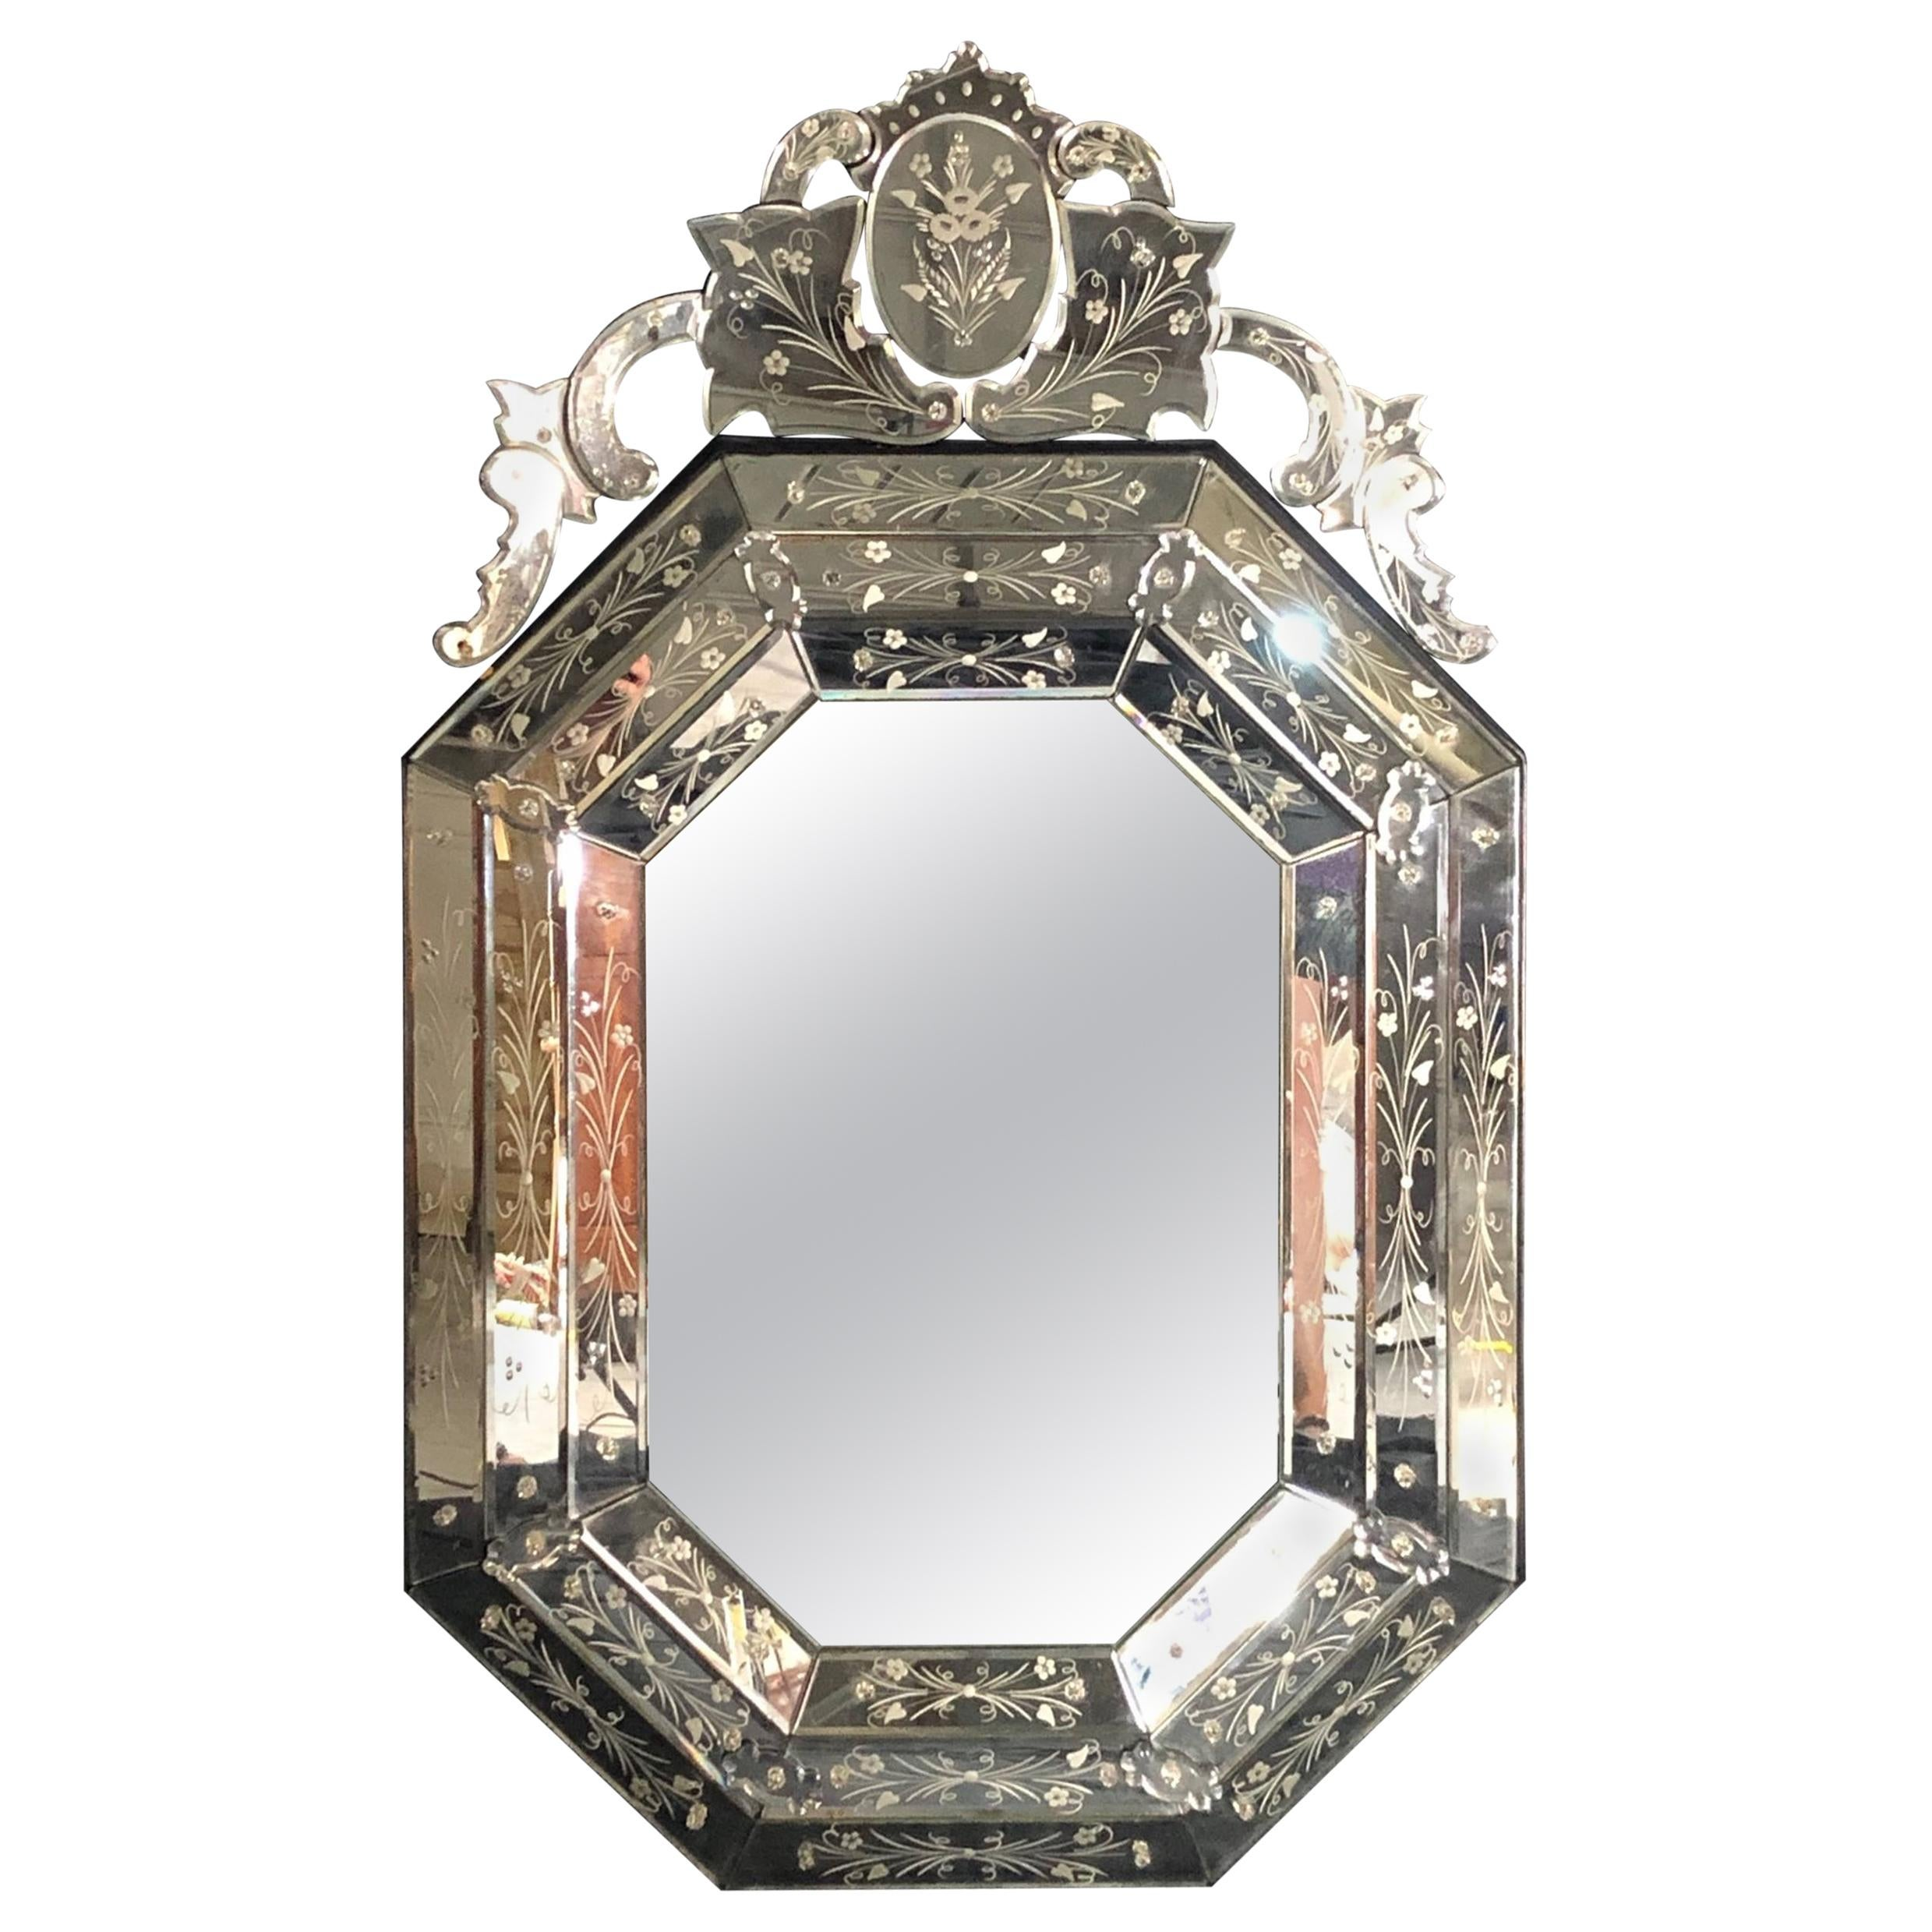 Large Impressive Octagonal Venetian Style Mirror